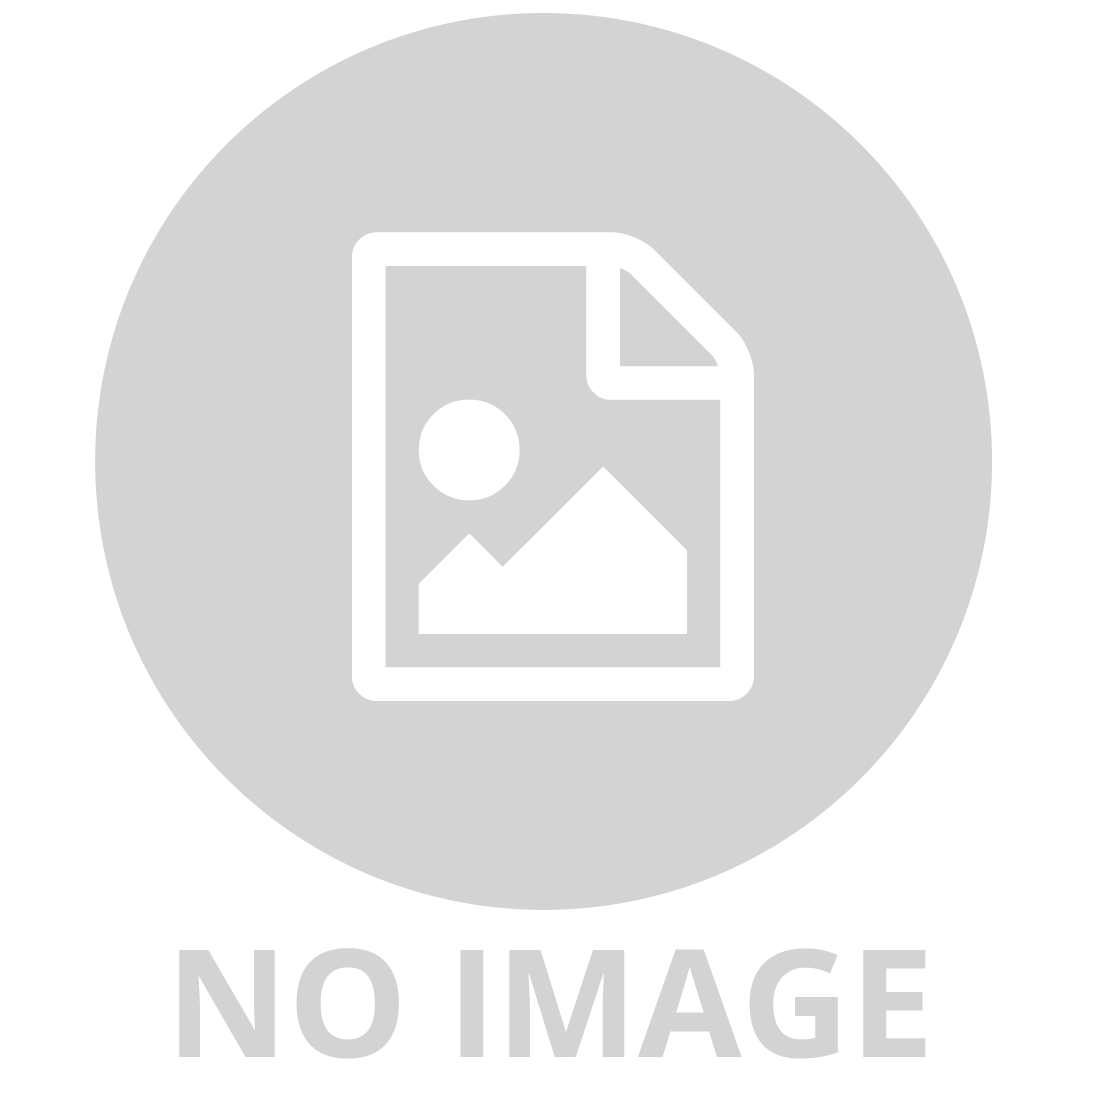 RAVENSBURGER 1500PC JIGSAW PUZZLE SEASONS OF NEW YORK